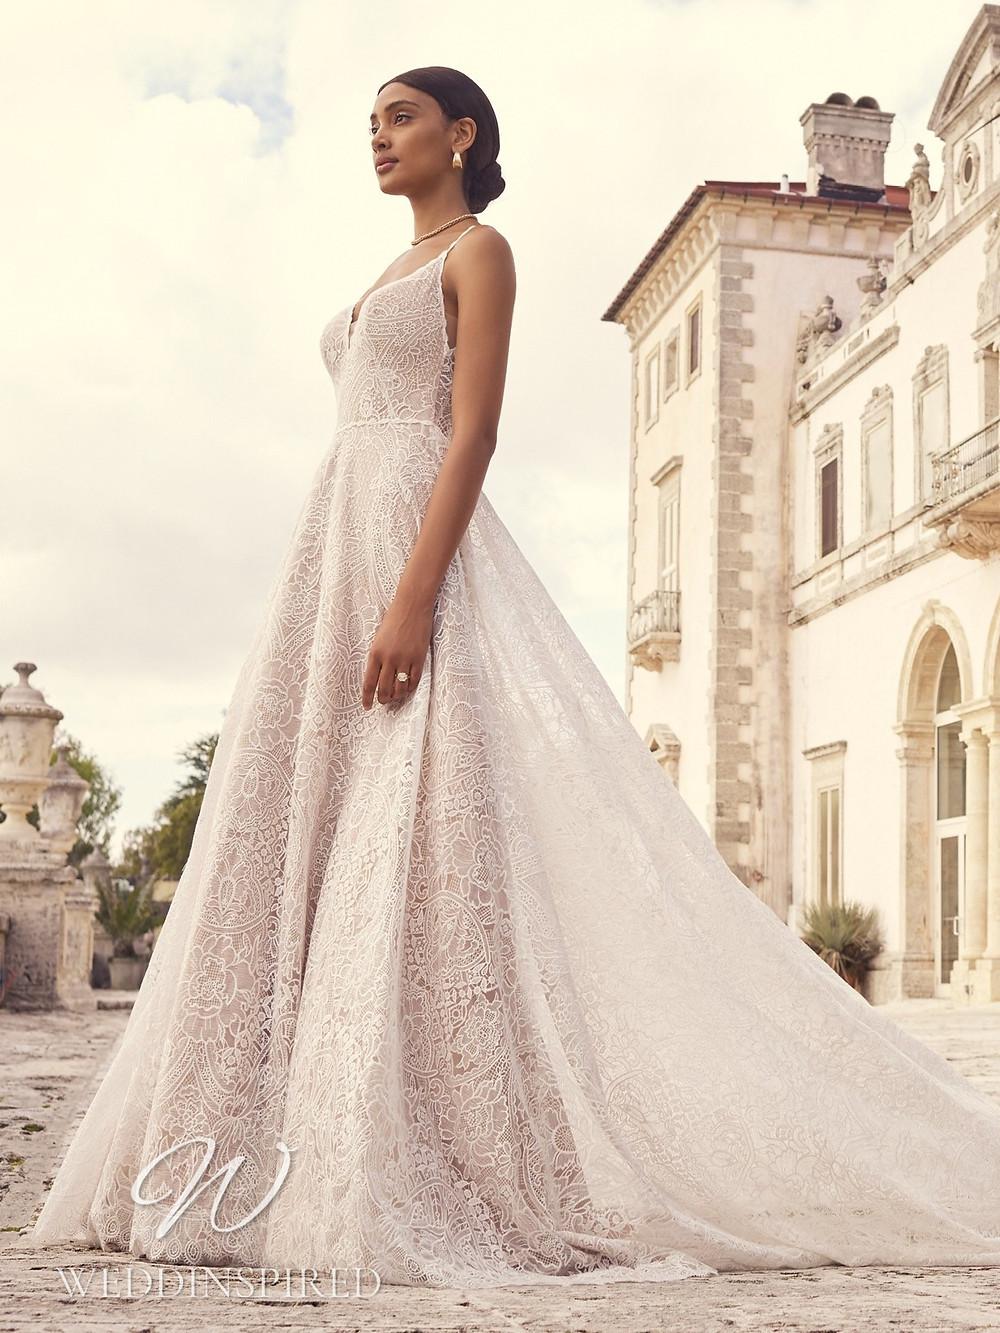 A Sottero & Midgley 2021 blush lace A-line wedding dress